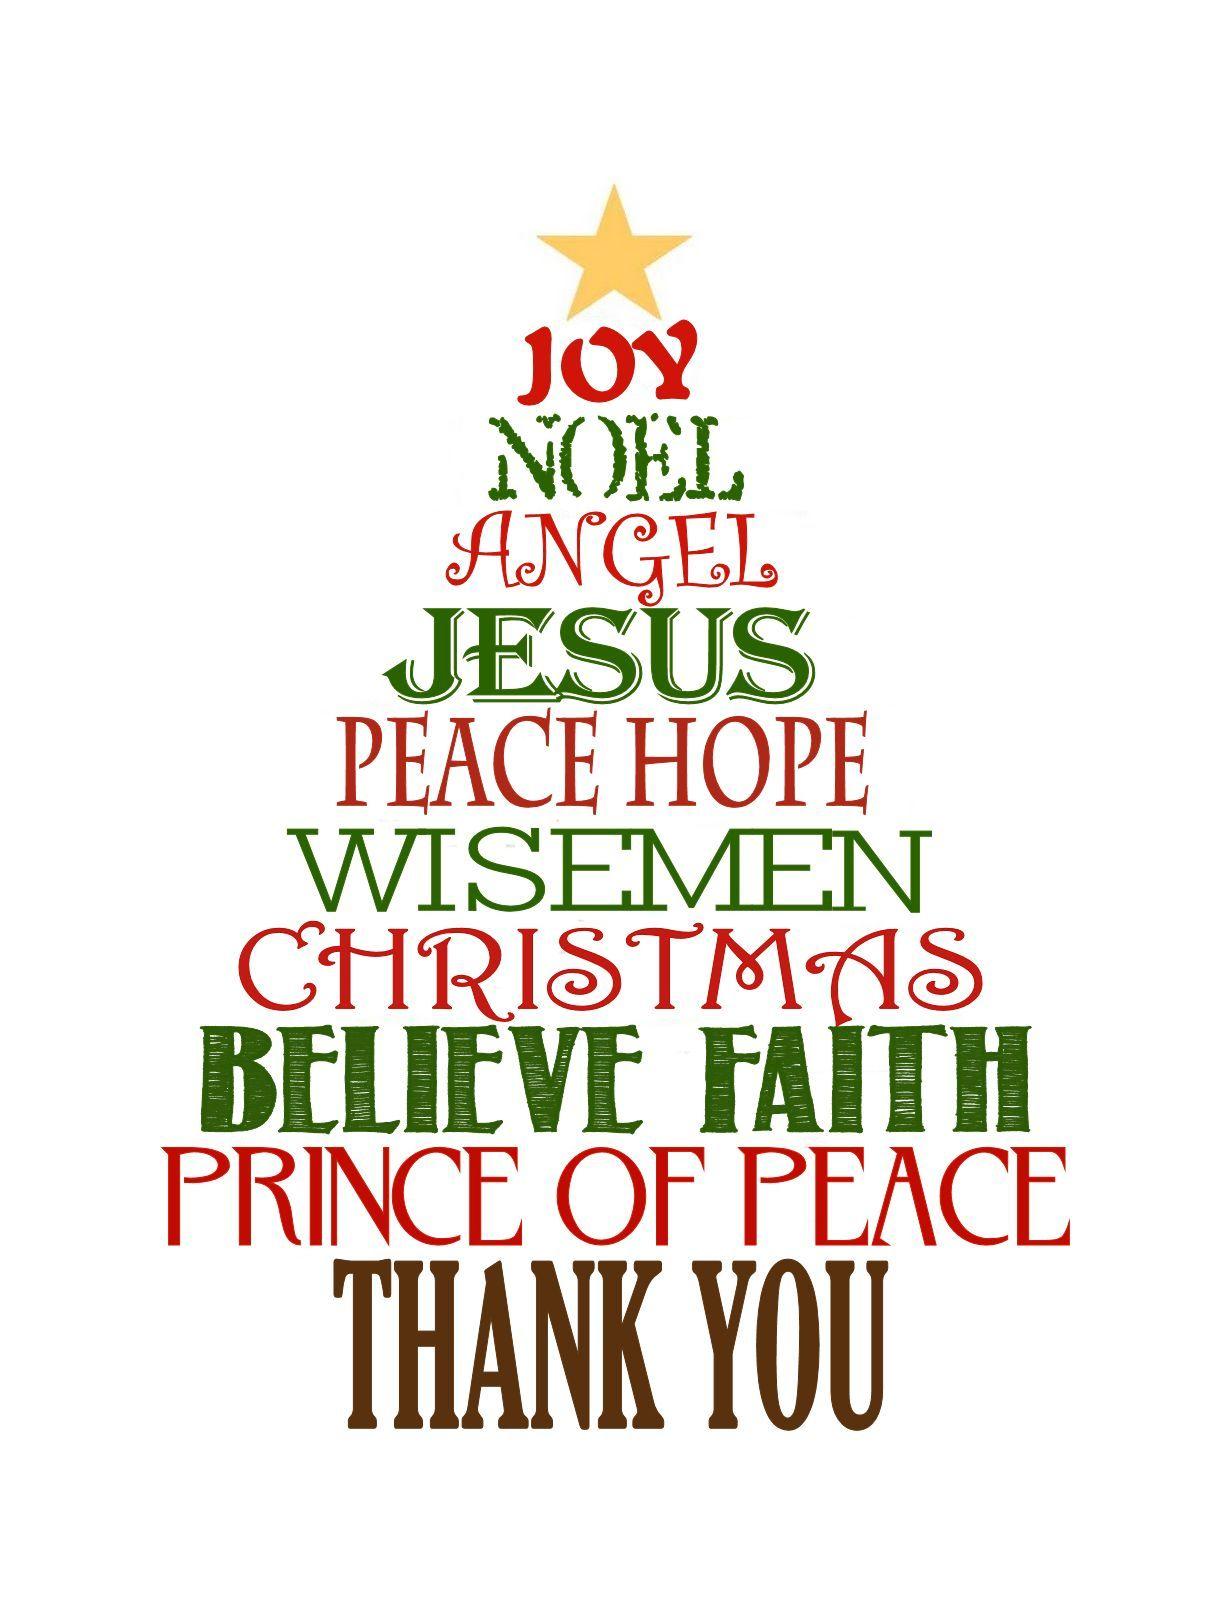 Free christmas christian clipart 5 » Clipart Portal.